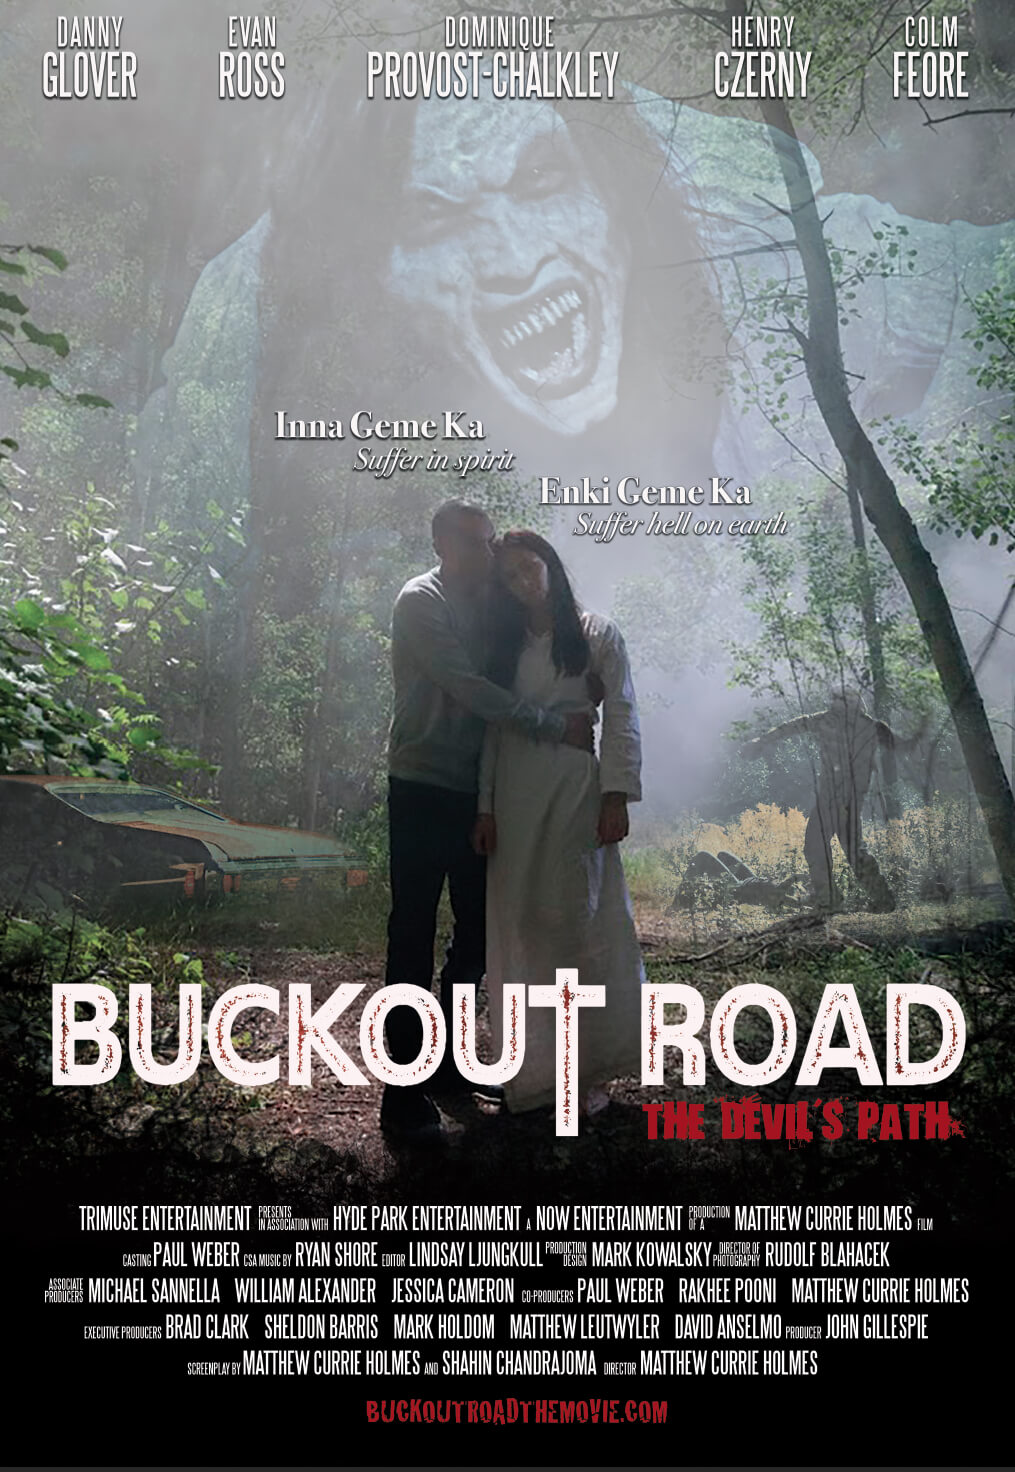 Buckout Road: The Devil's Path